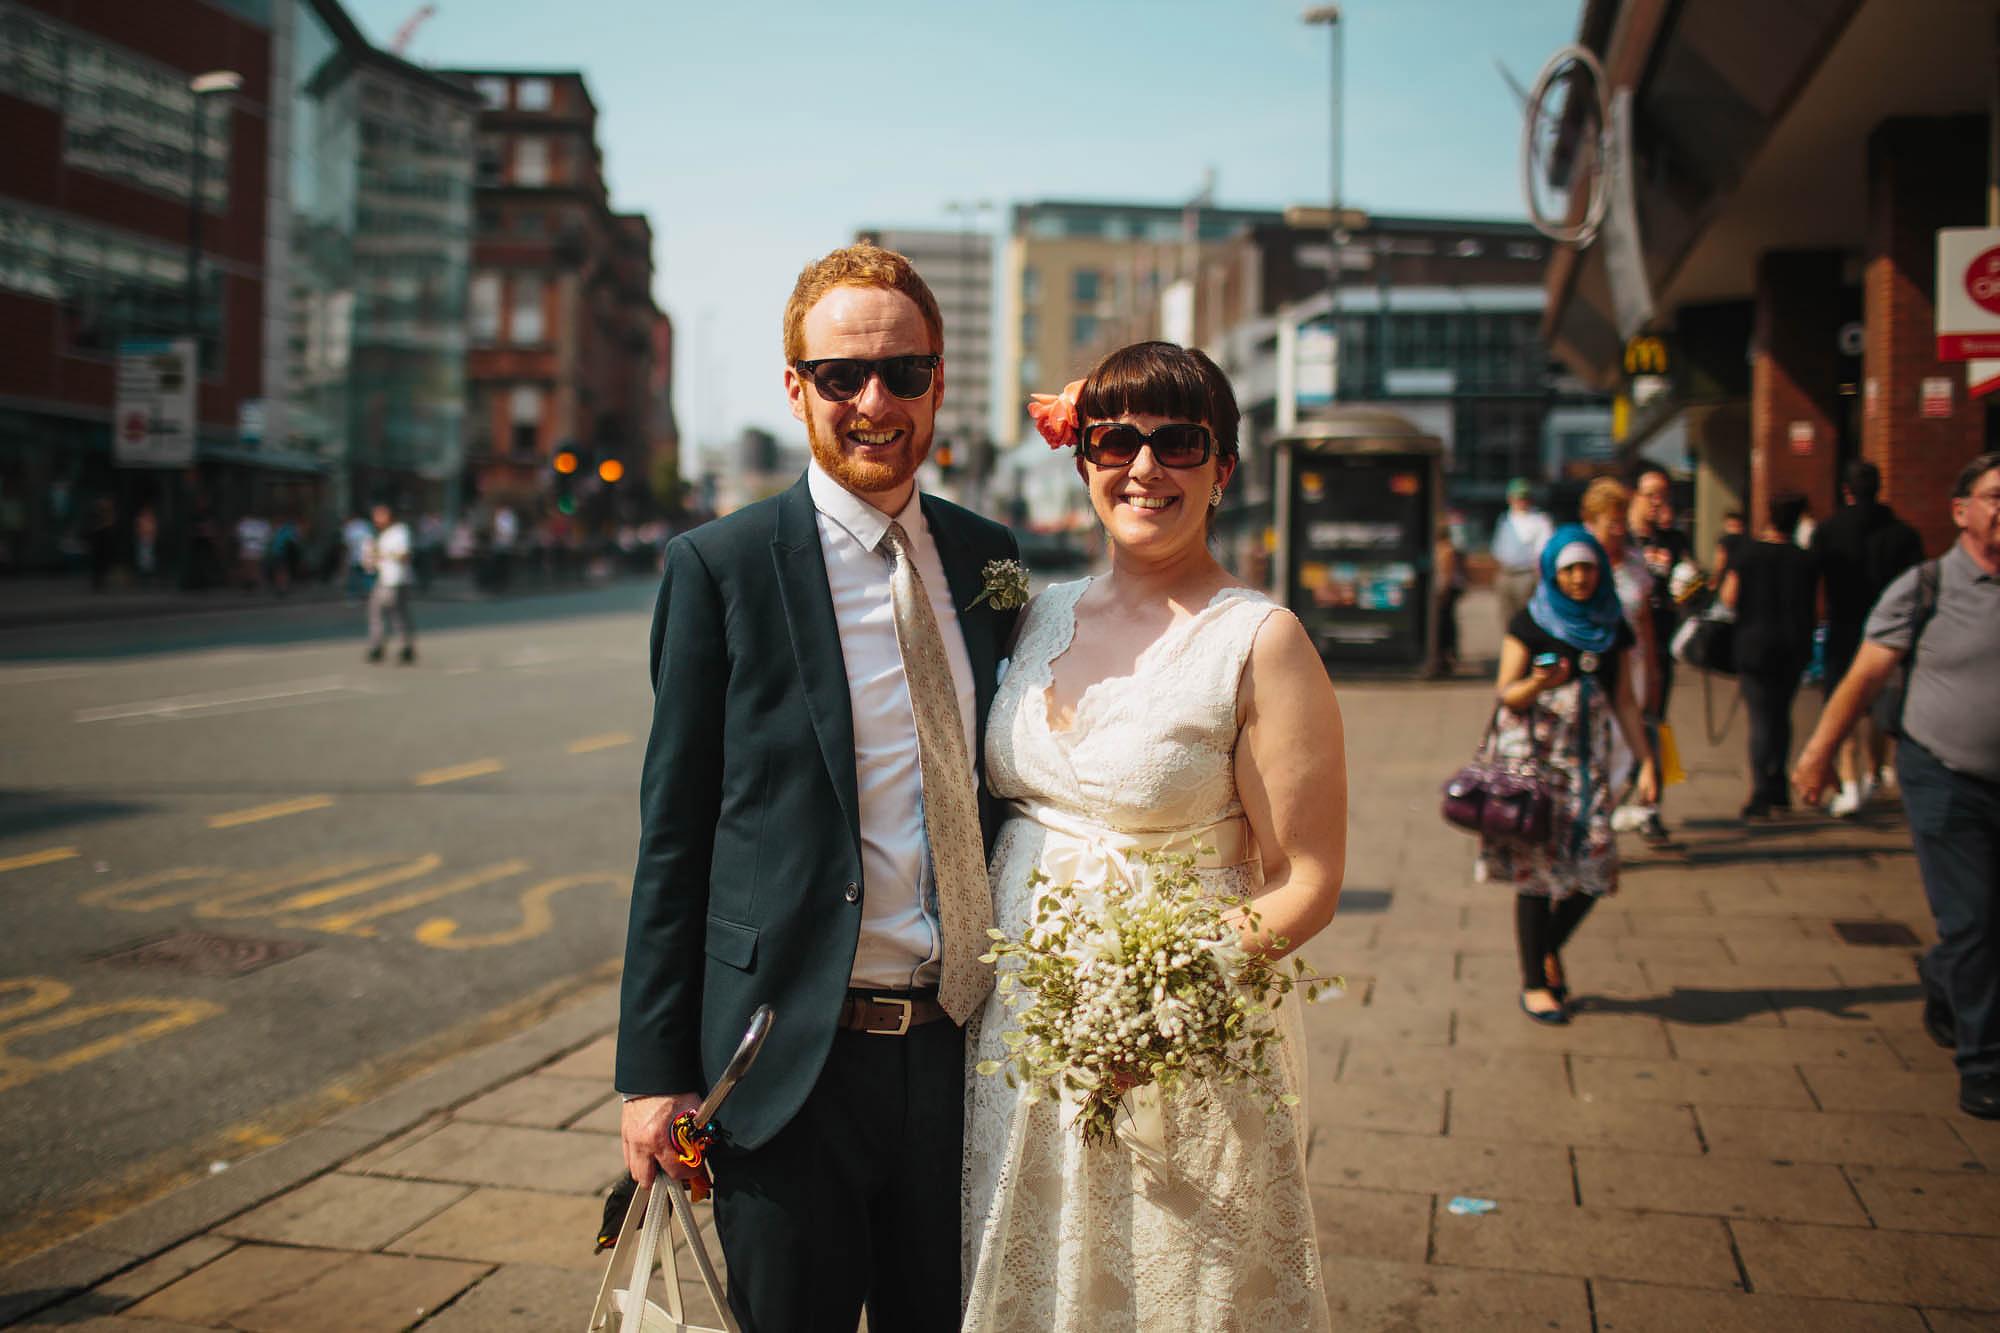 Leeds Yorkshire Wedding Photographer City Centre Bride Groom